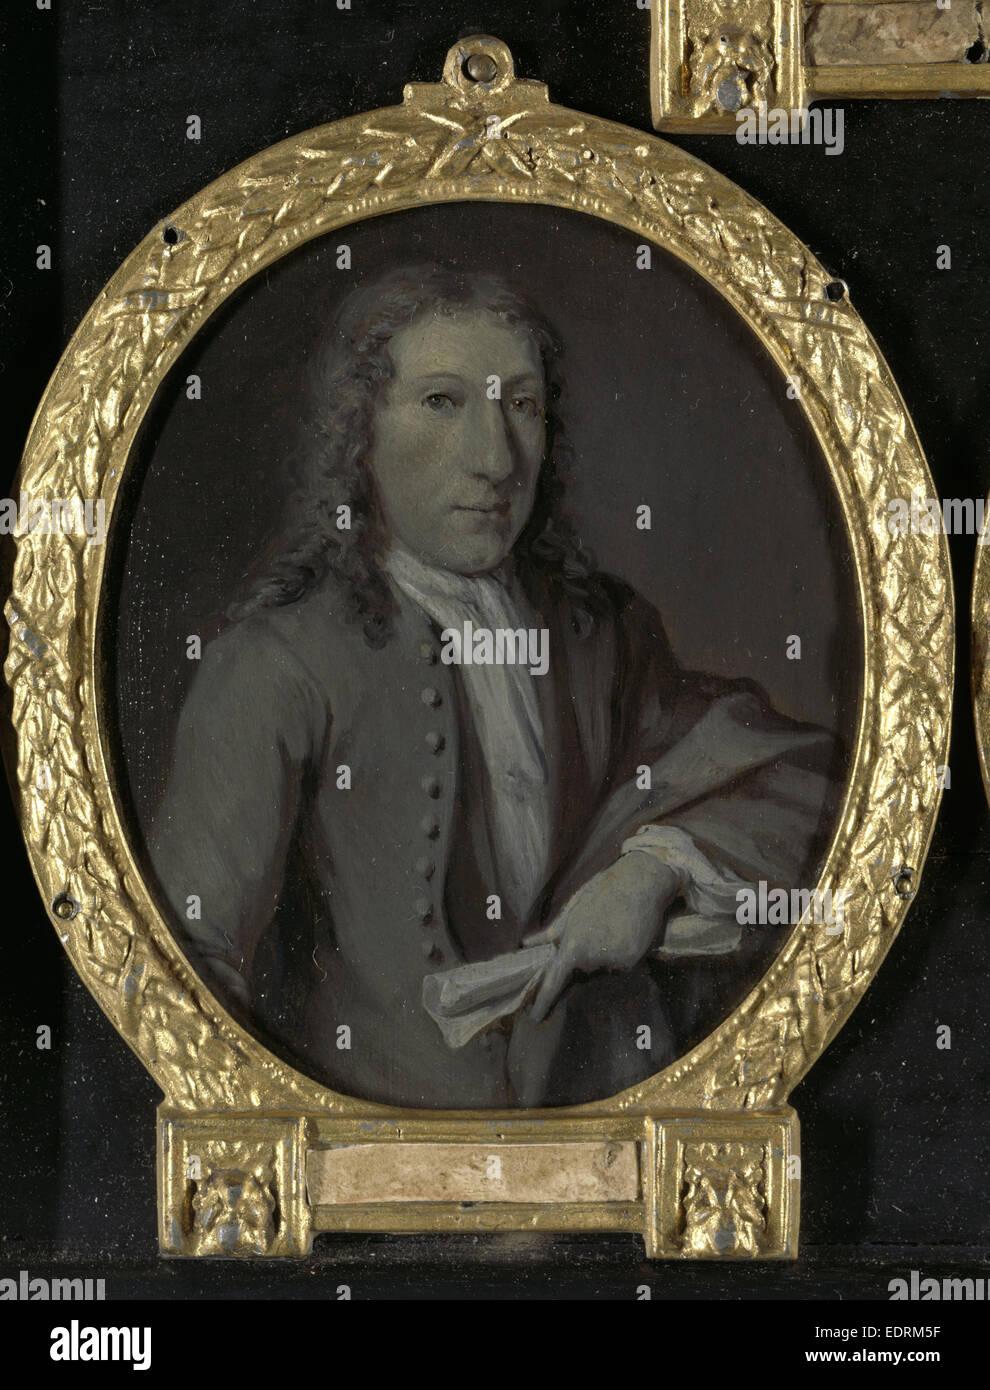 Portrait of Gijsbert Tijssens, Playwright in Amsterdam The Netherlands, Jan Maurits Quinkhard, 1732 - 1771 - Stock Image